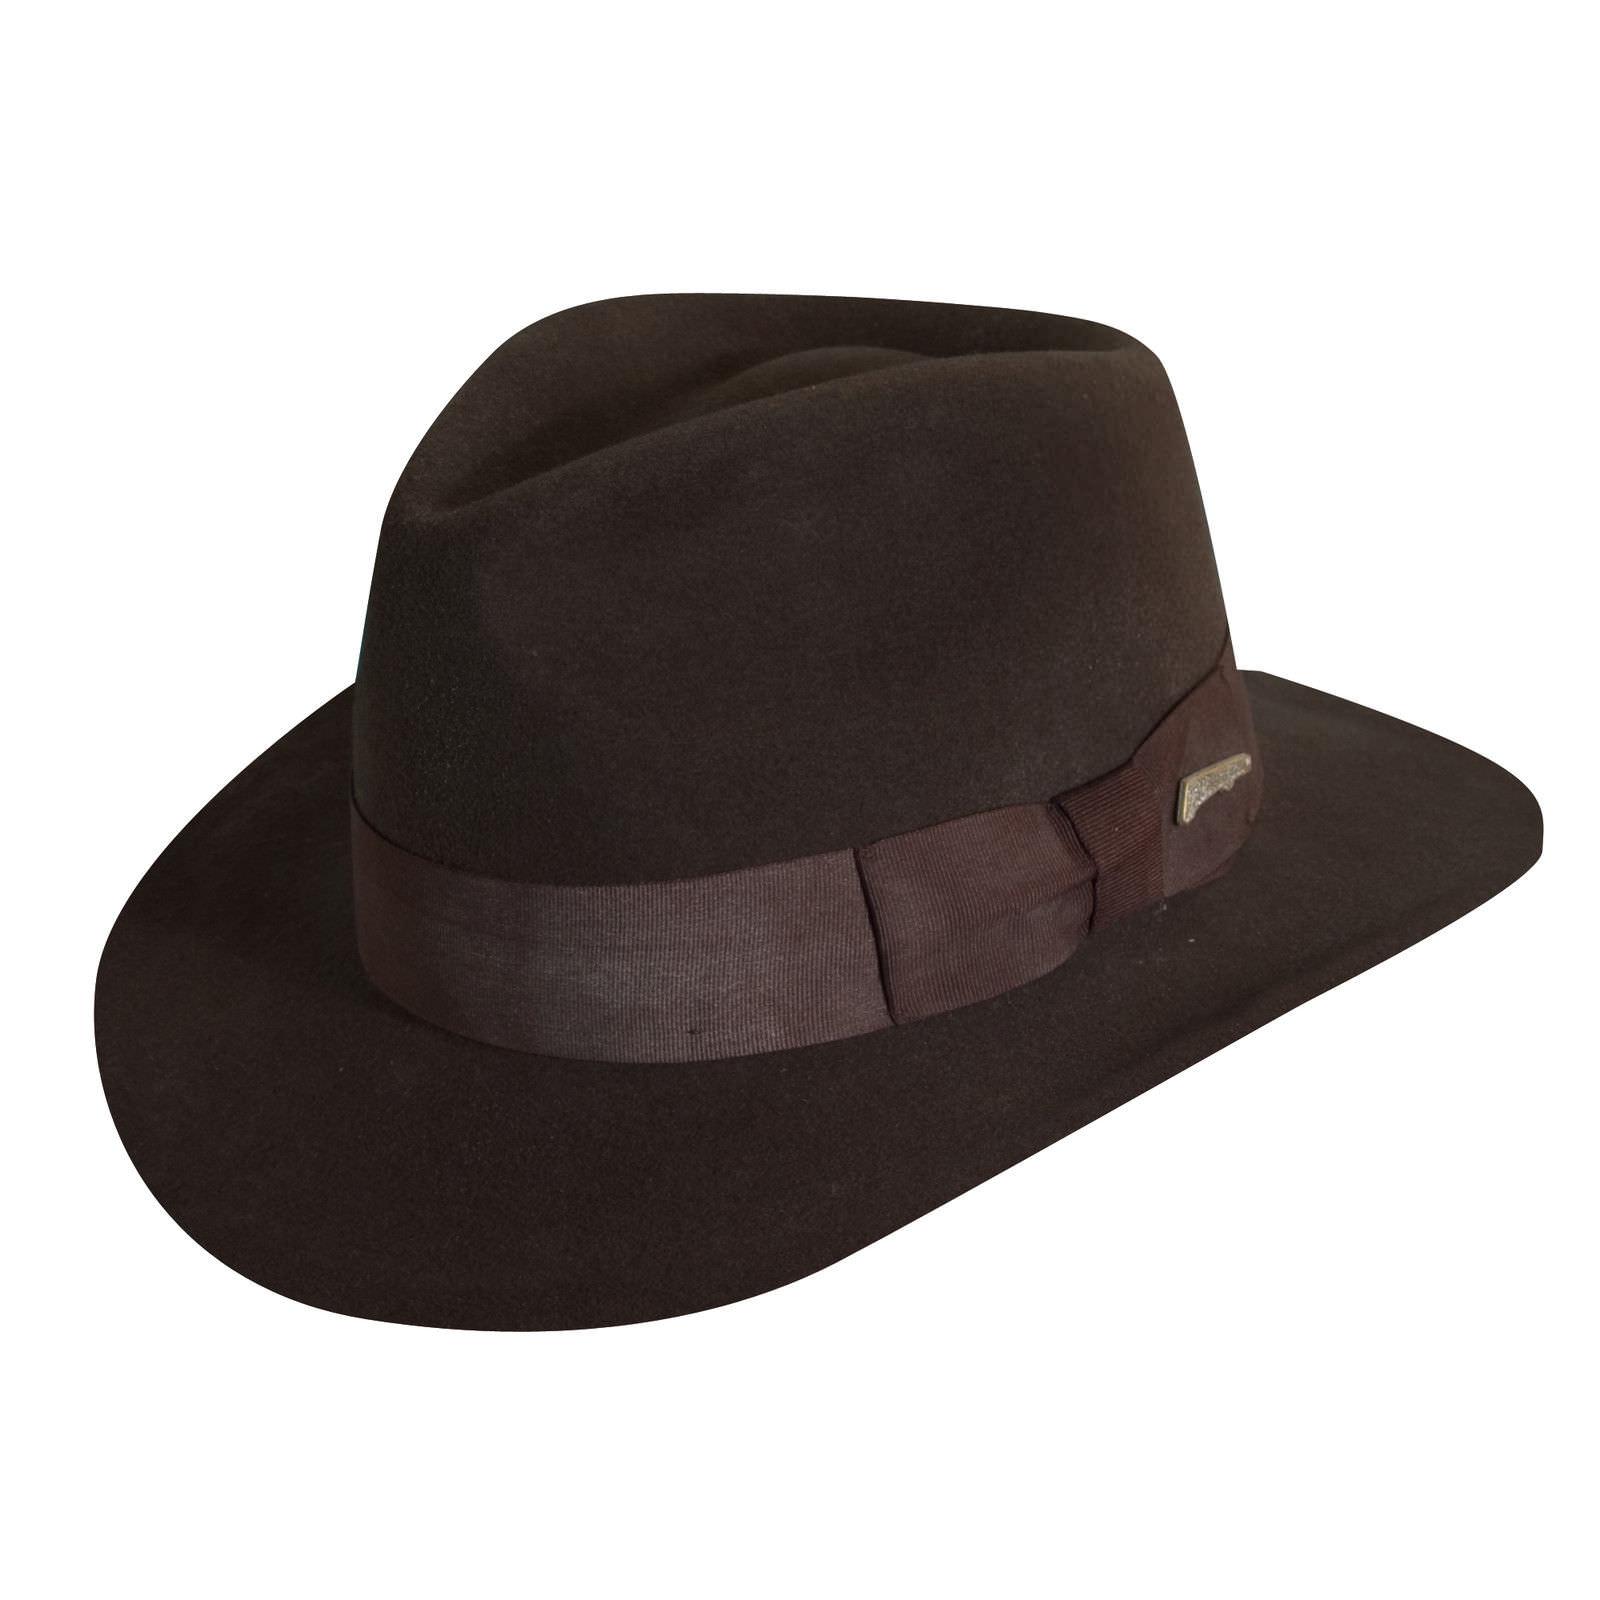 7ae21e1d95ccc Indiana Jones Crushable Wool Felt Fedora  DelMonico Hatter